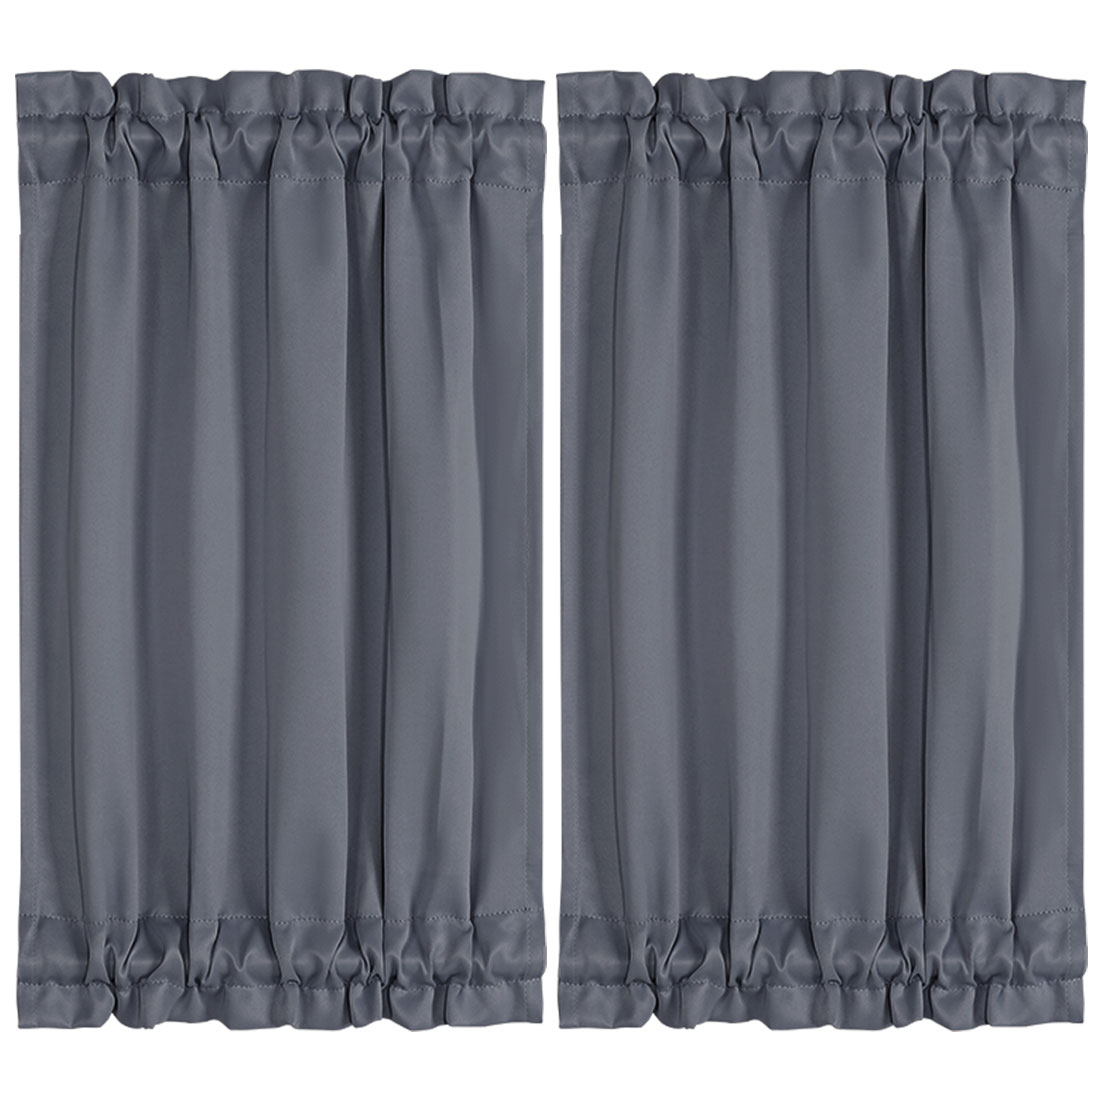 "2pcs Blackout Curtains Sliding Door Panel Darkening Drape Dark Gray 25"" x 40"""